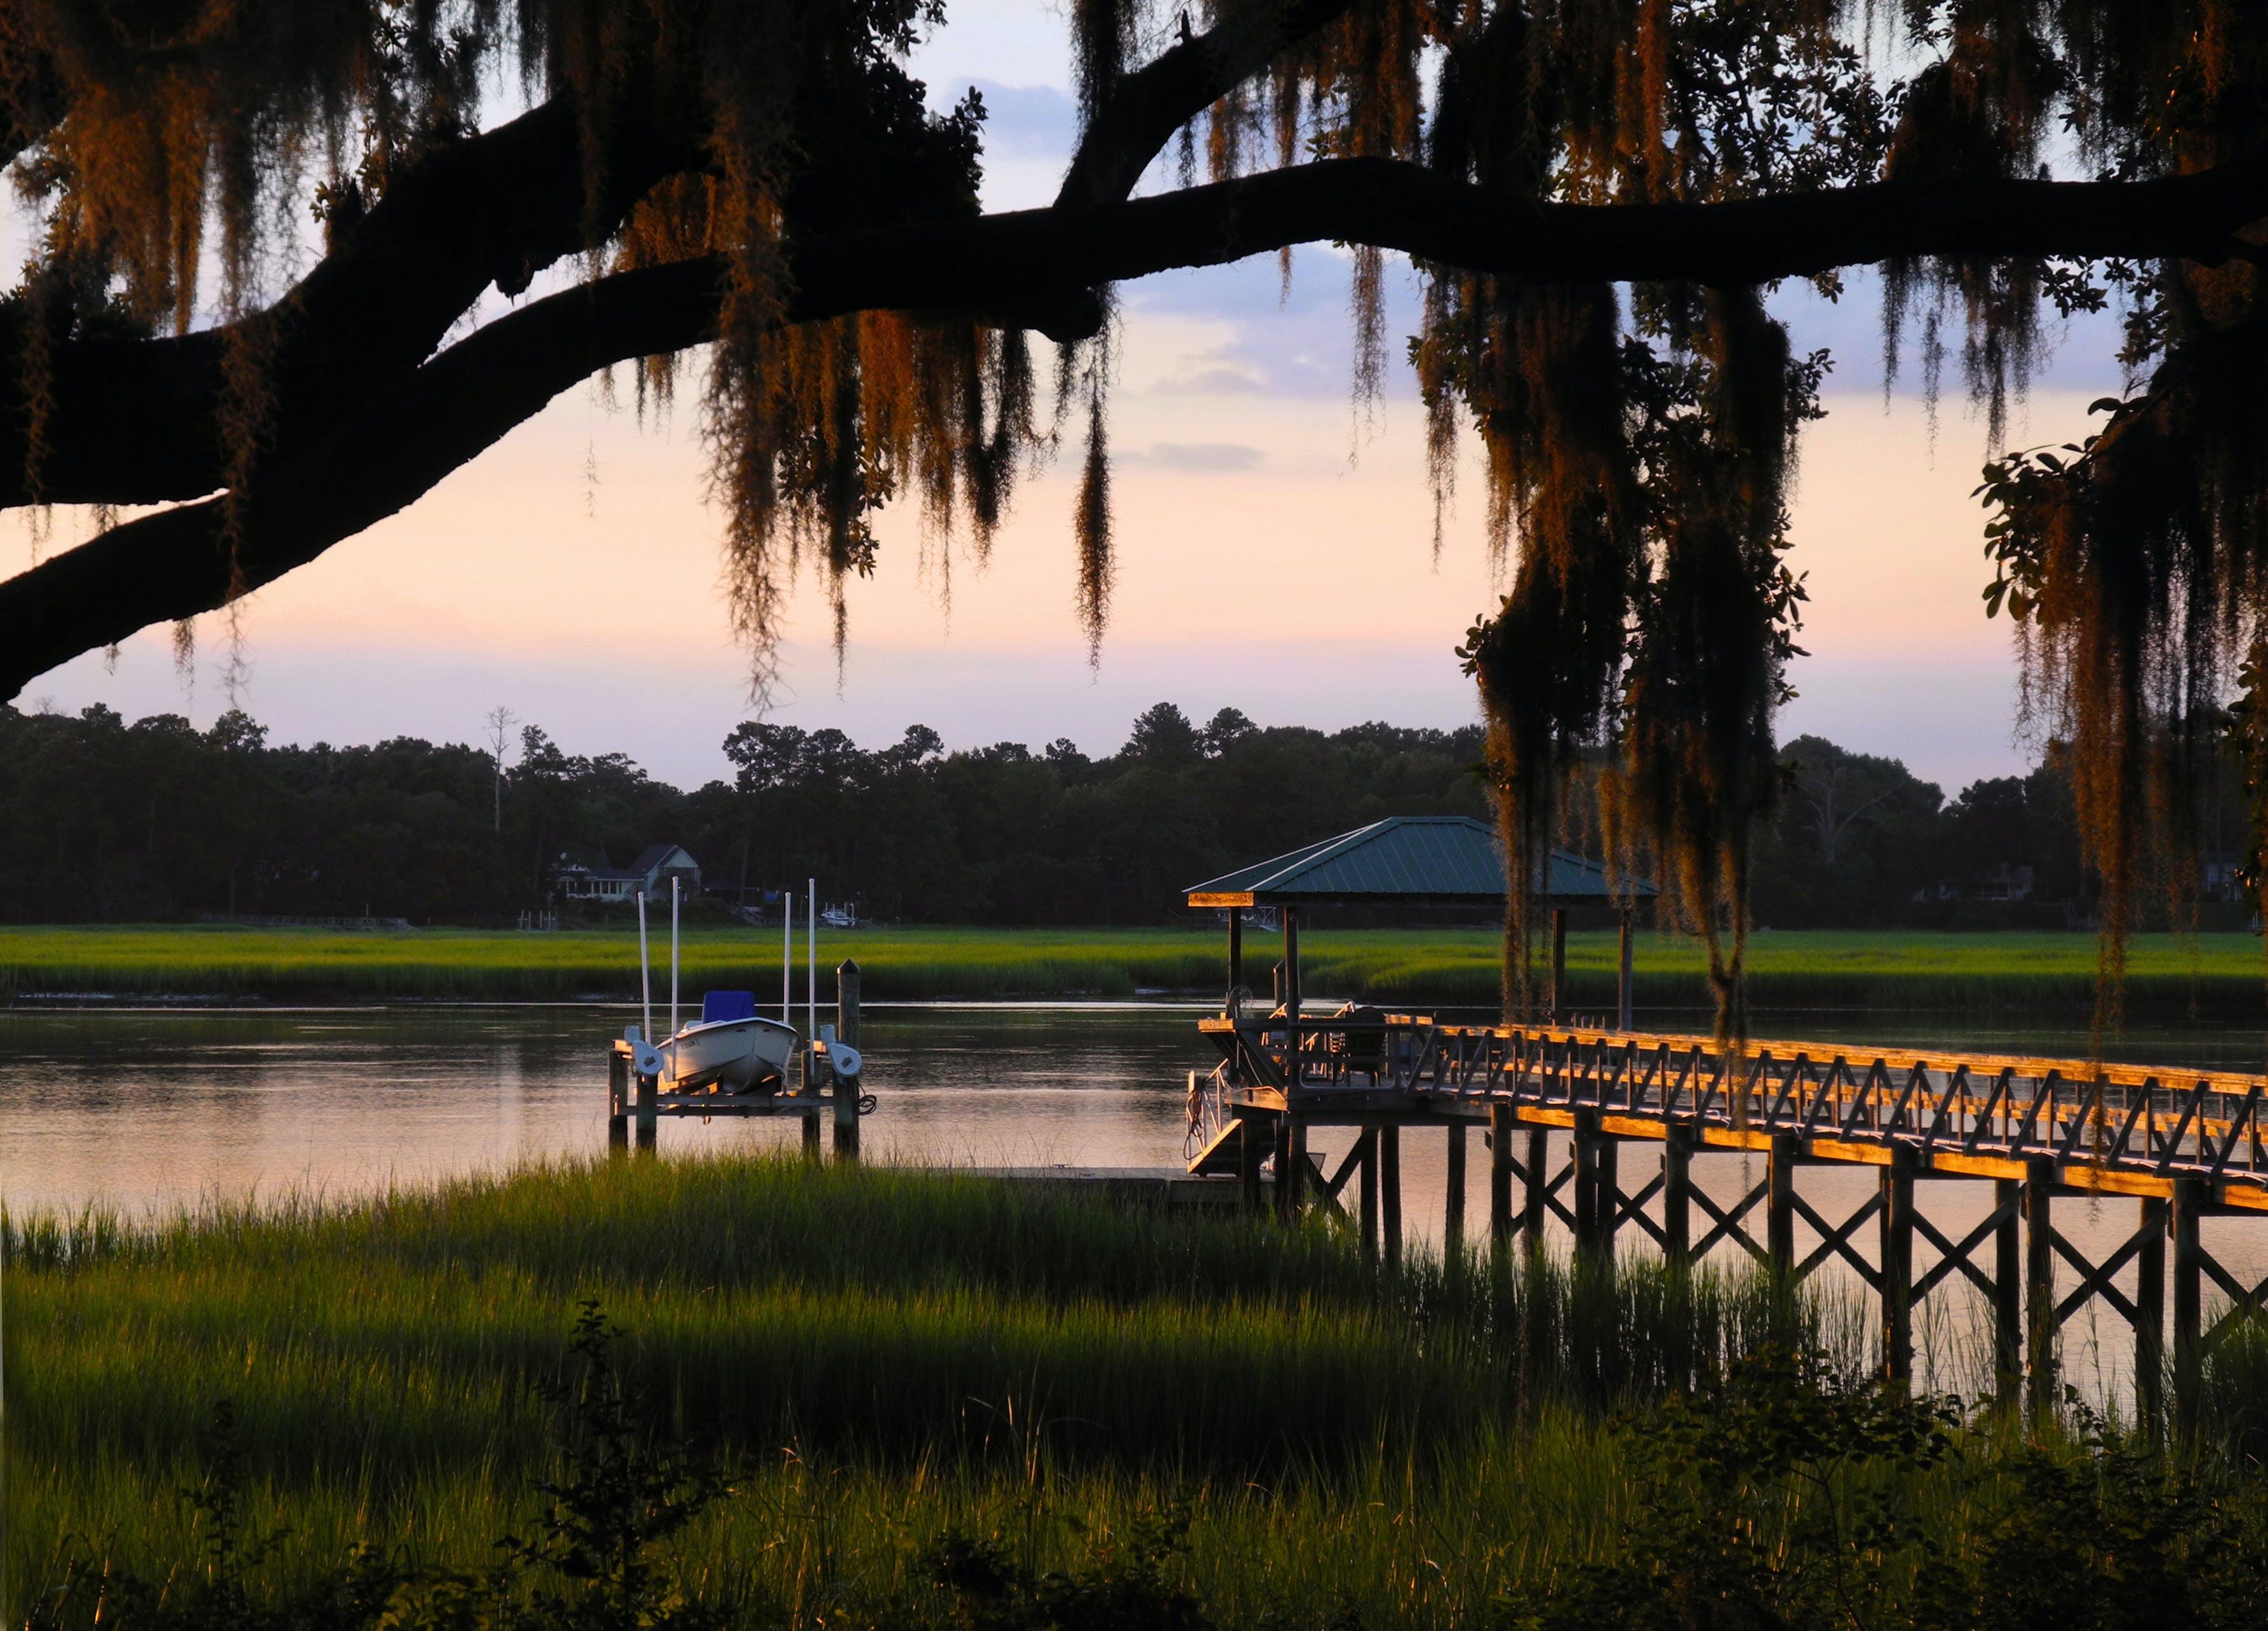 Free stock photo of South Carolina Low Country